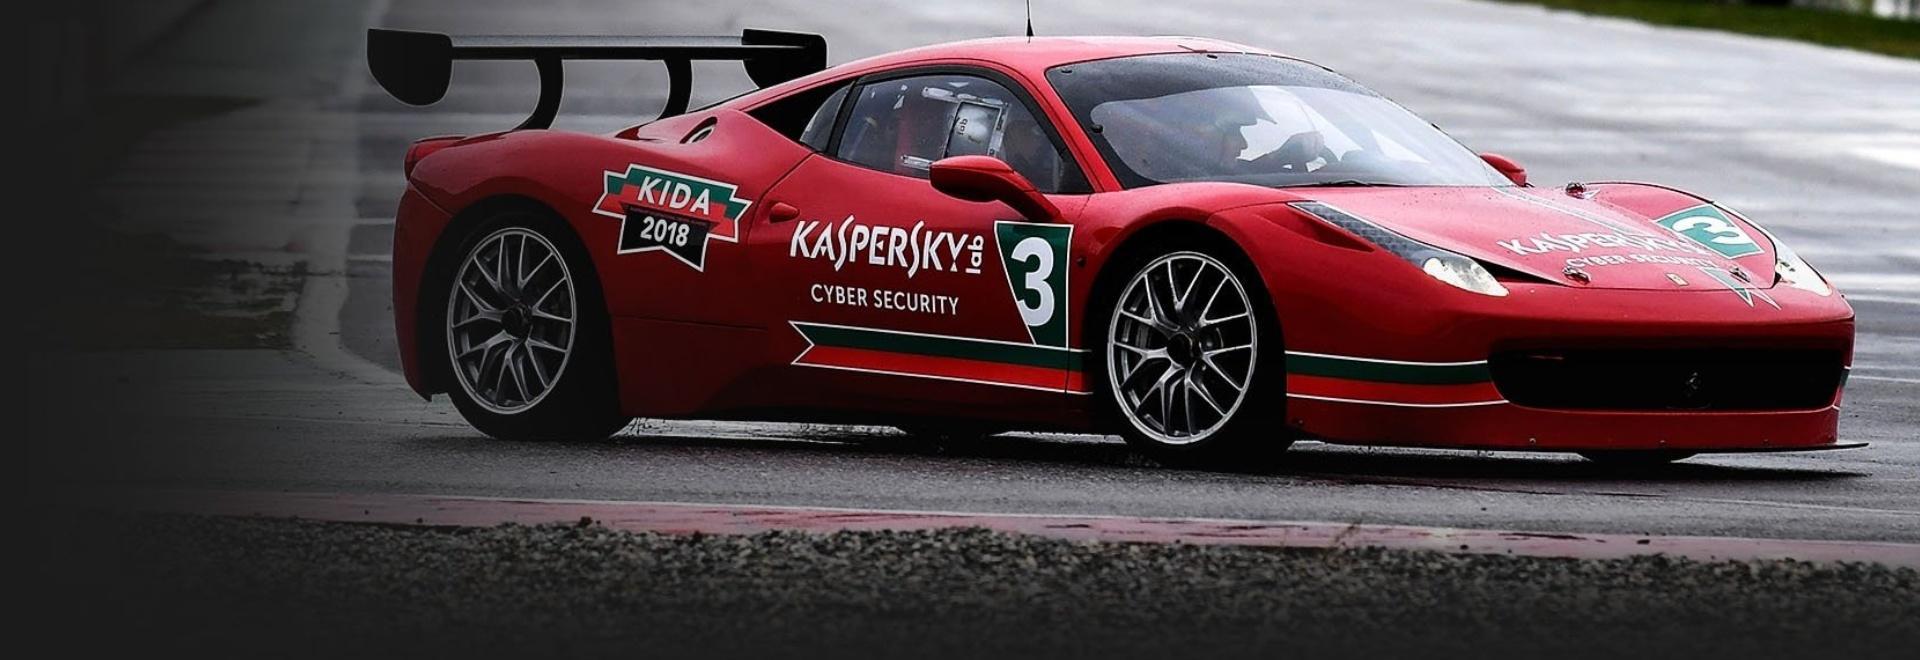 Trofeo Pirelli & Trofeo Pirelli AM. Finale Mondiale